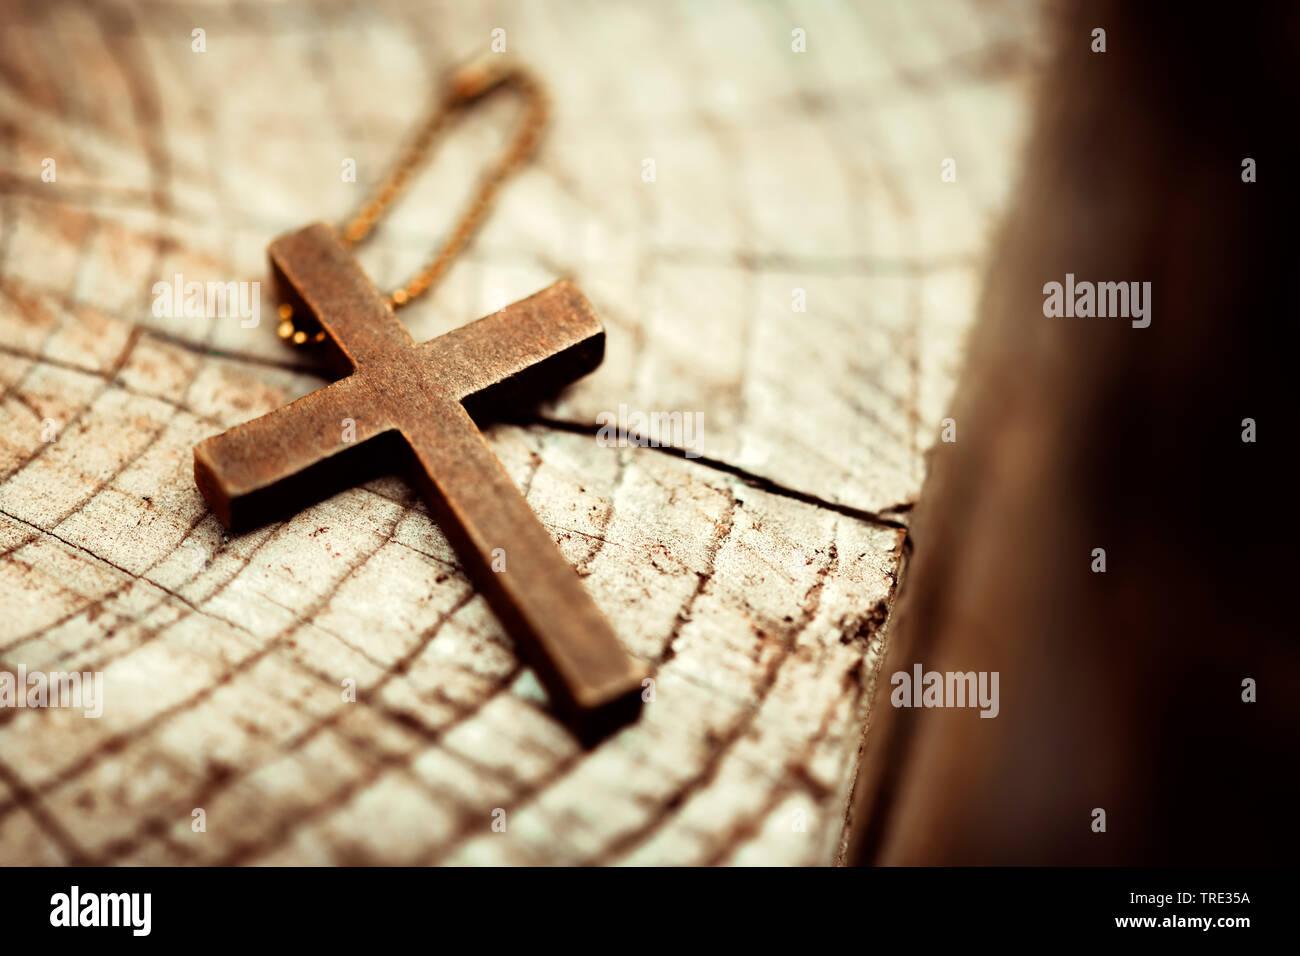 Kreuz liegt auf einer Bank, Deutschland | cross lying on a bench, Germany | BLWS515947.jpg [ (c) blickwinkel/McPHOTO/C. Ohde Tel. +49 (0)2302-2793220, - Stock Image